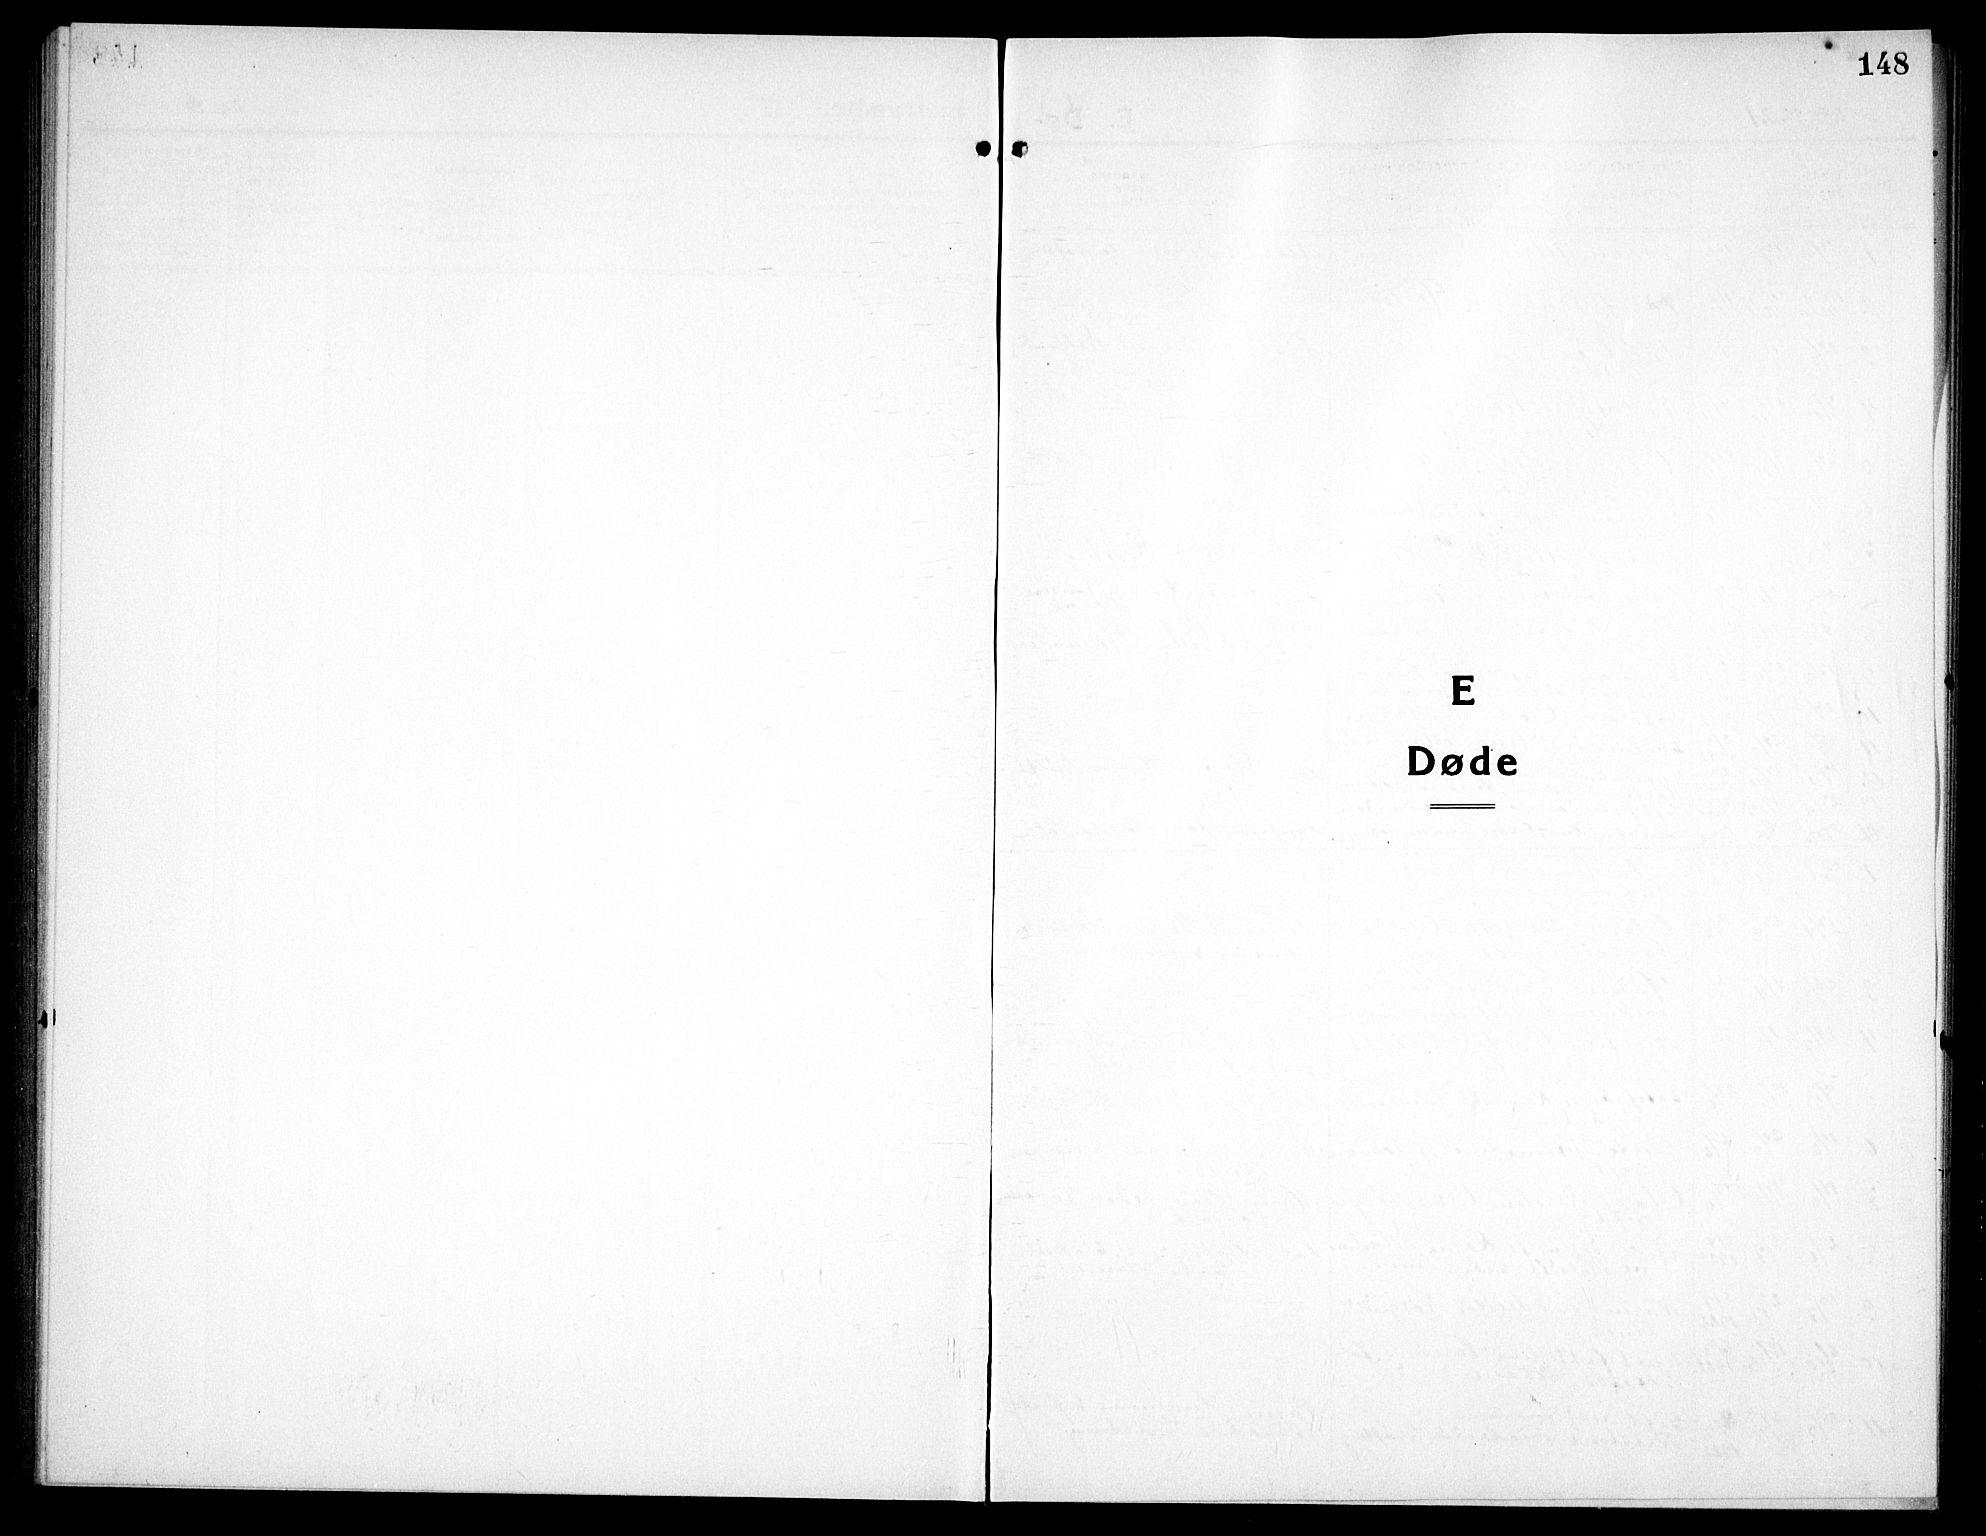 SAT, Ministerialprotokoller, klokkerbøker og fødselsregistre - Sør-Trøndelag, 656/L0696: Parish register (copy) no. 656C02, 1921-1937, p. 148